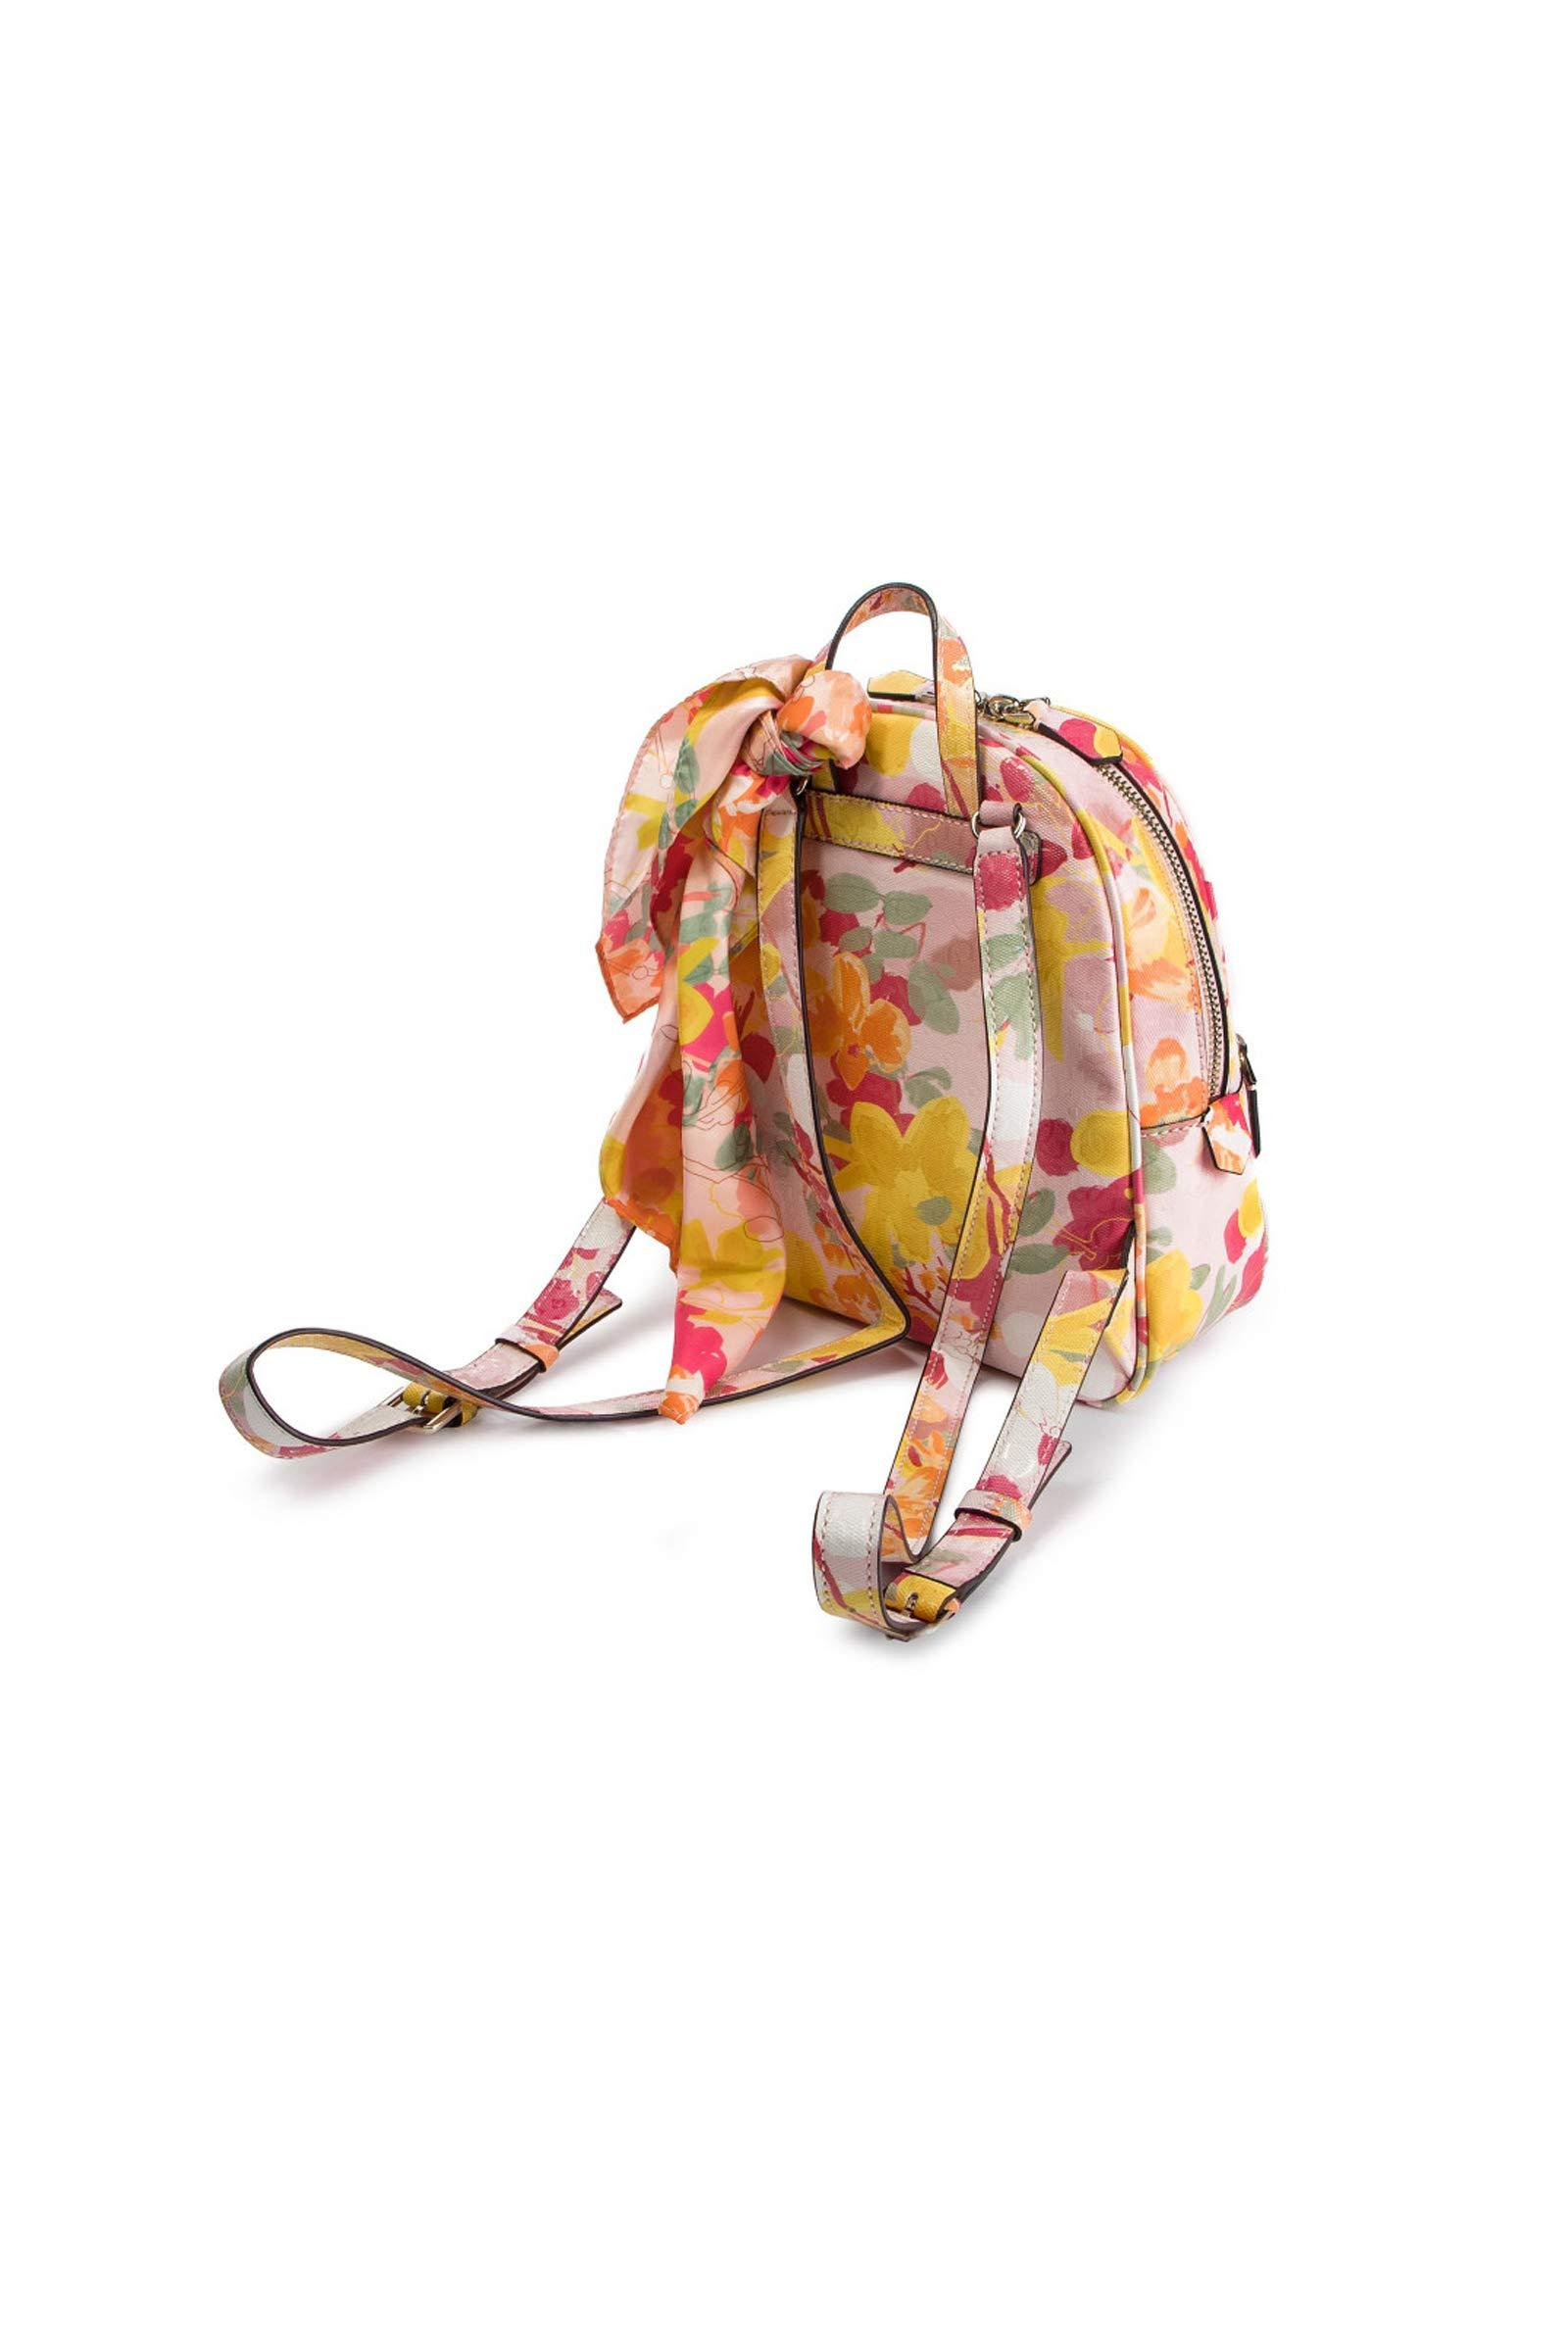 71W3QExKo5L - Guess Shannon Backpack - Mochilas Mujer